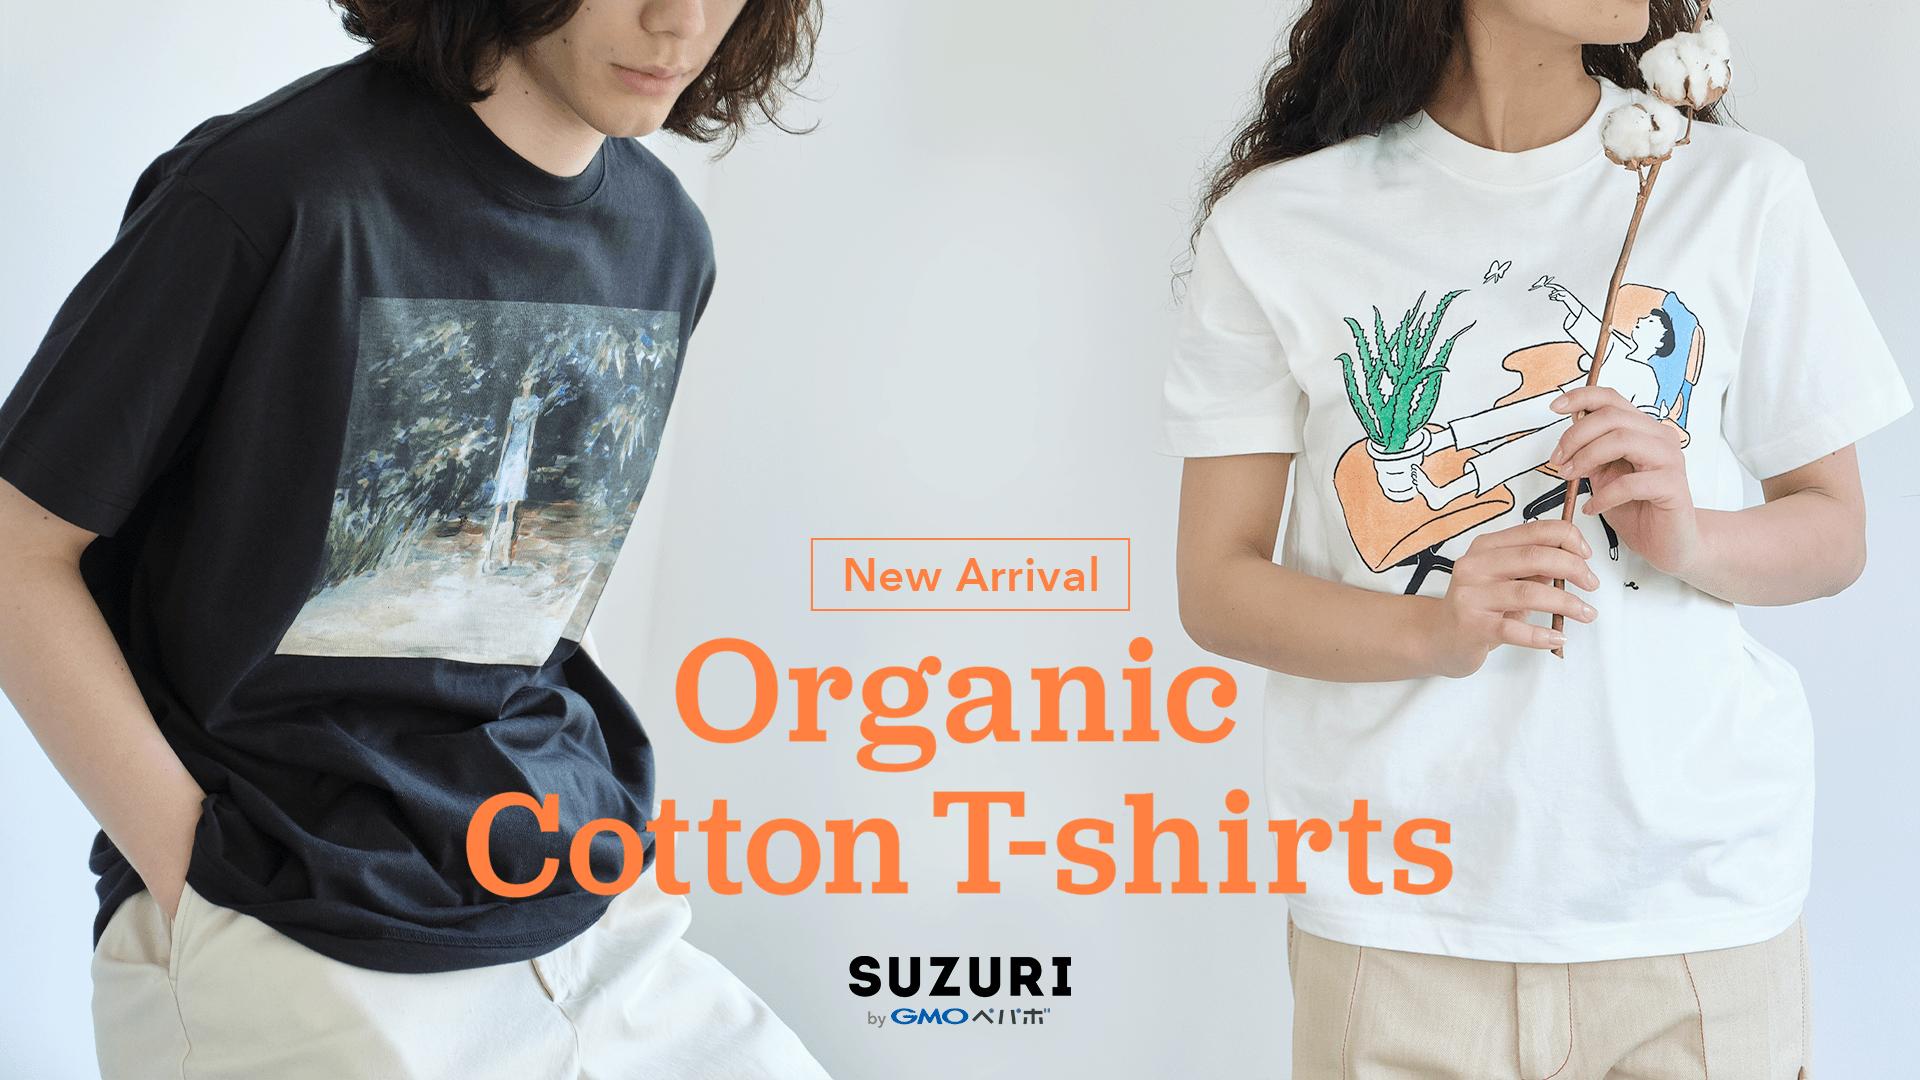 New Arrival Organic Cotton T-shirts SUZURI byGMOペパボ